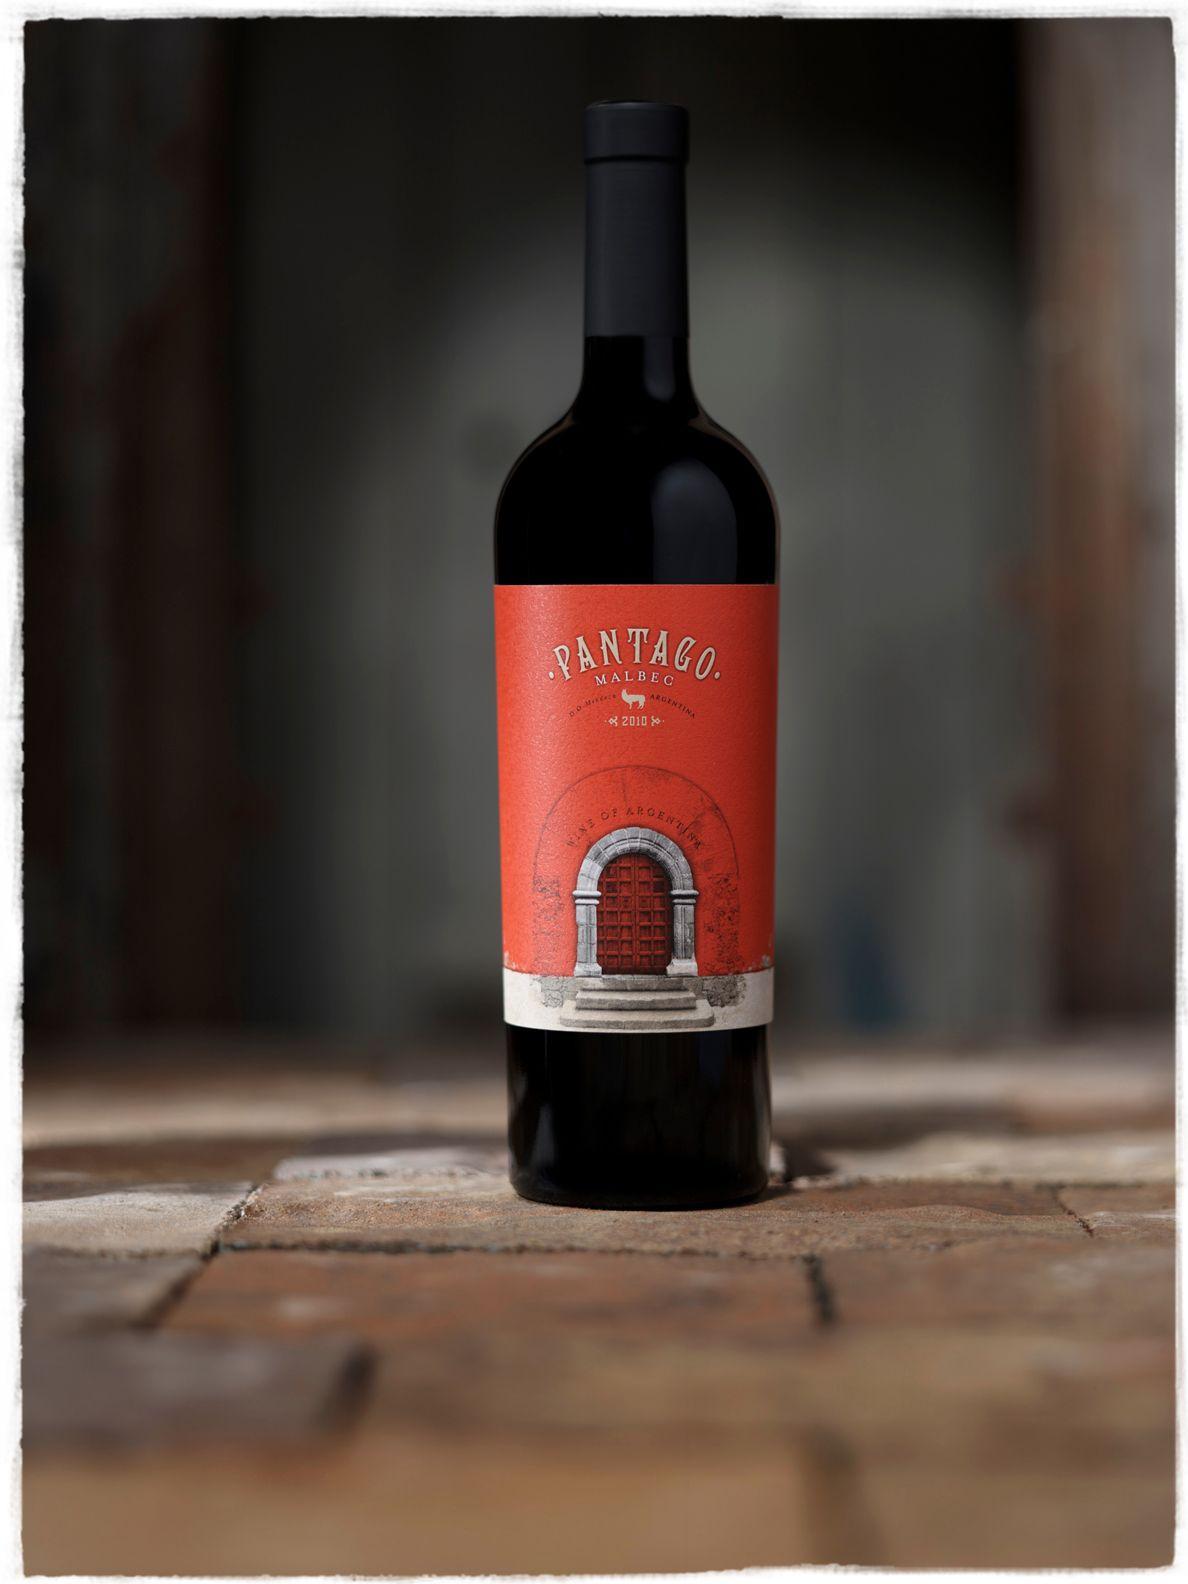 Pantago Beauty Malbec V1 Rt Jpg 1188 1584 Malbec Wine Recipes Wine